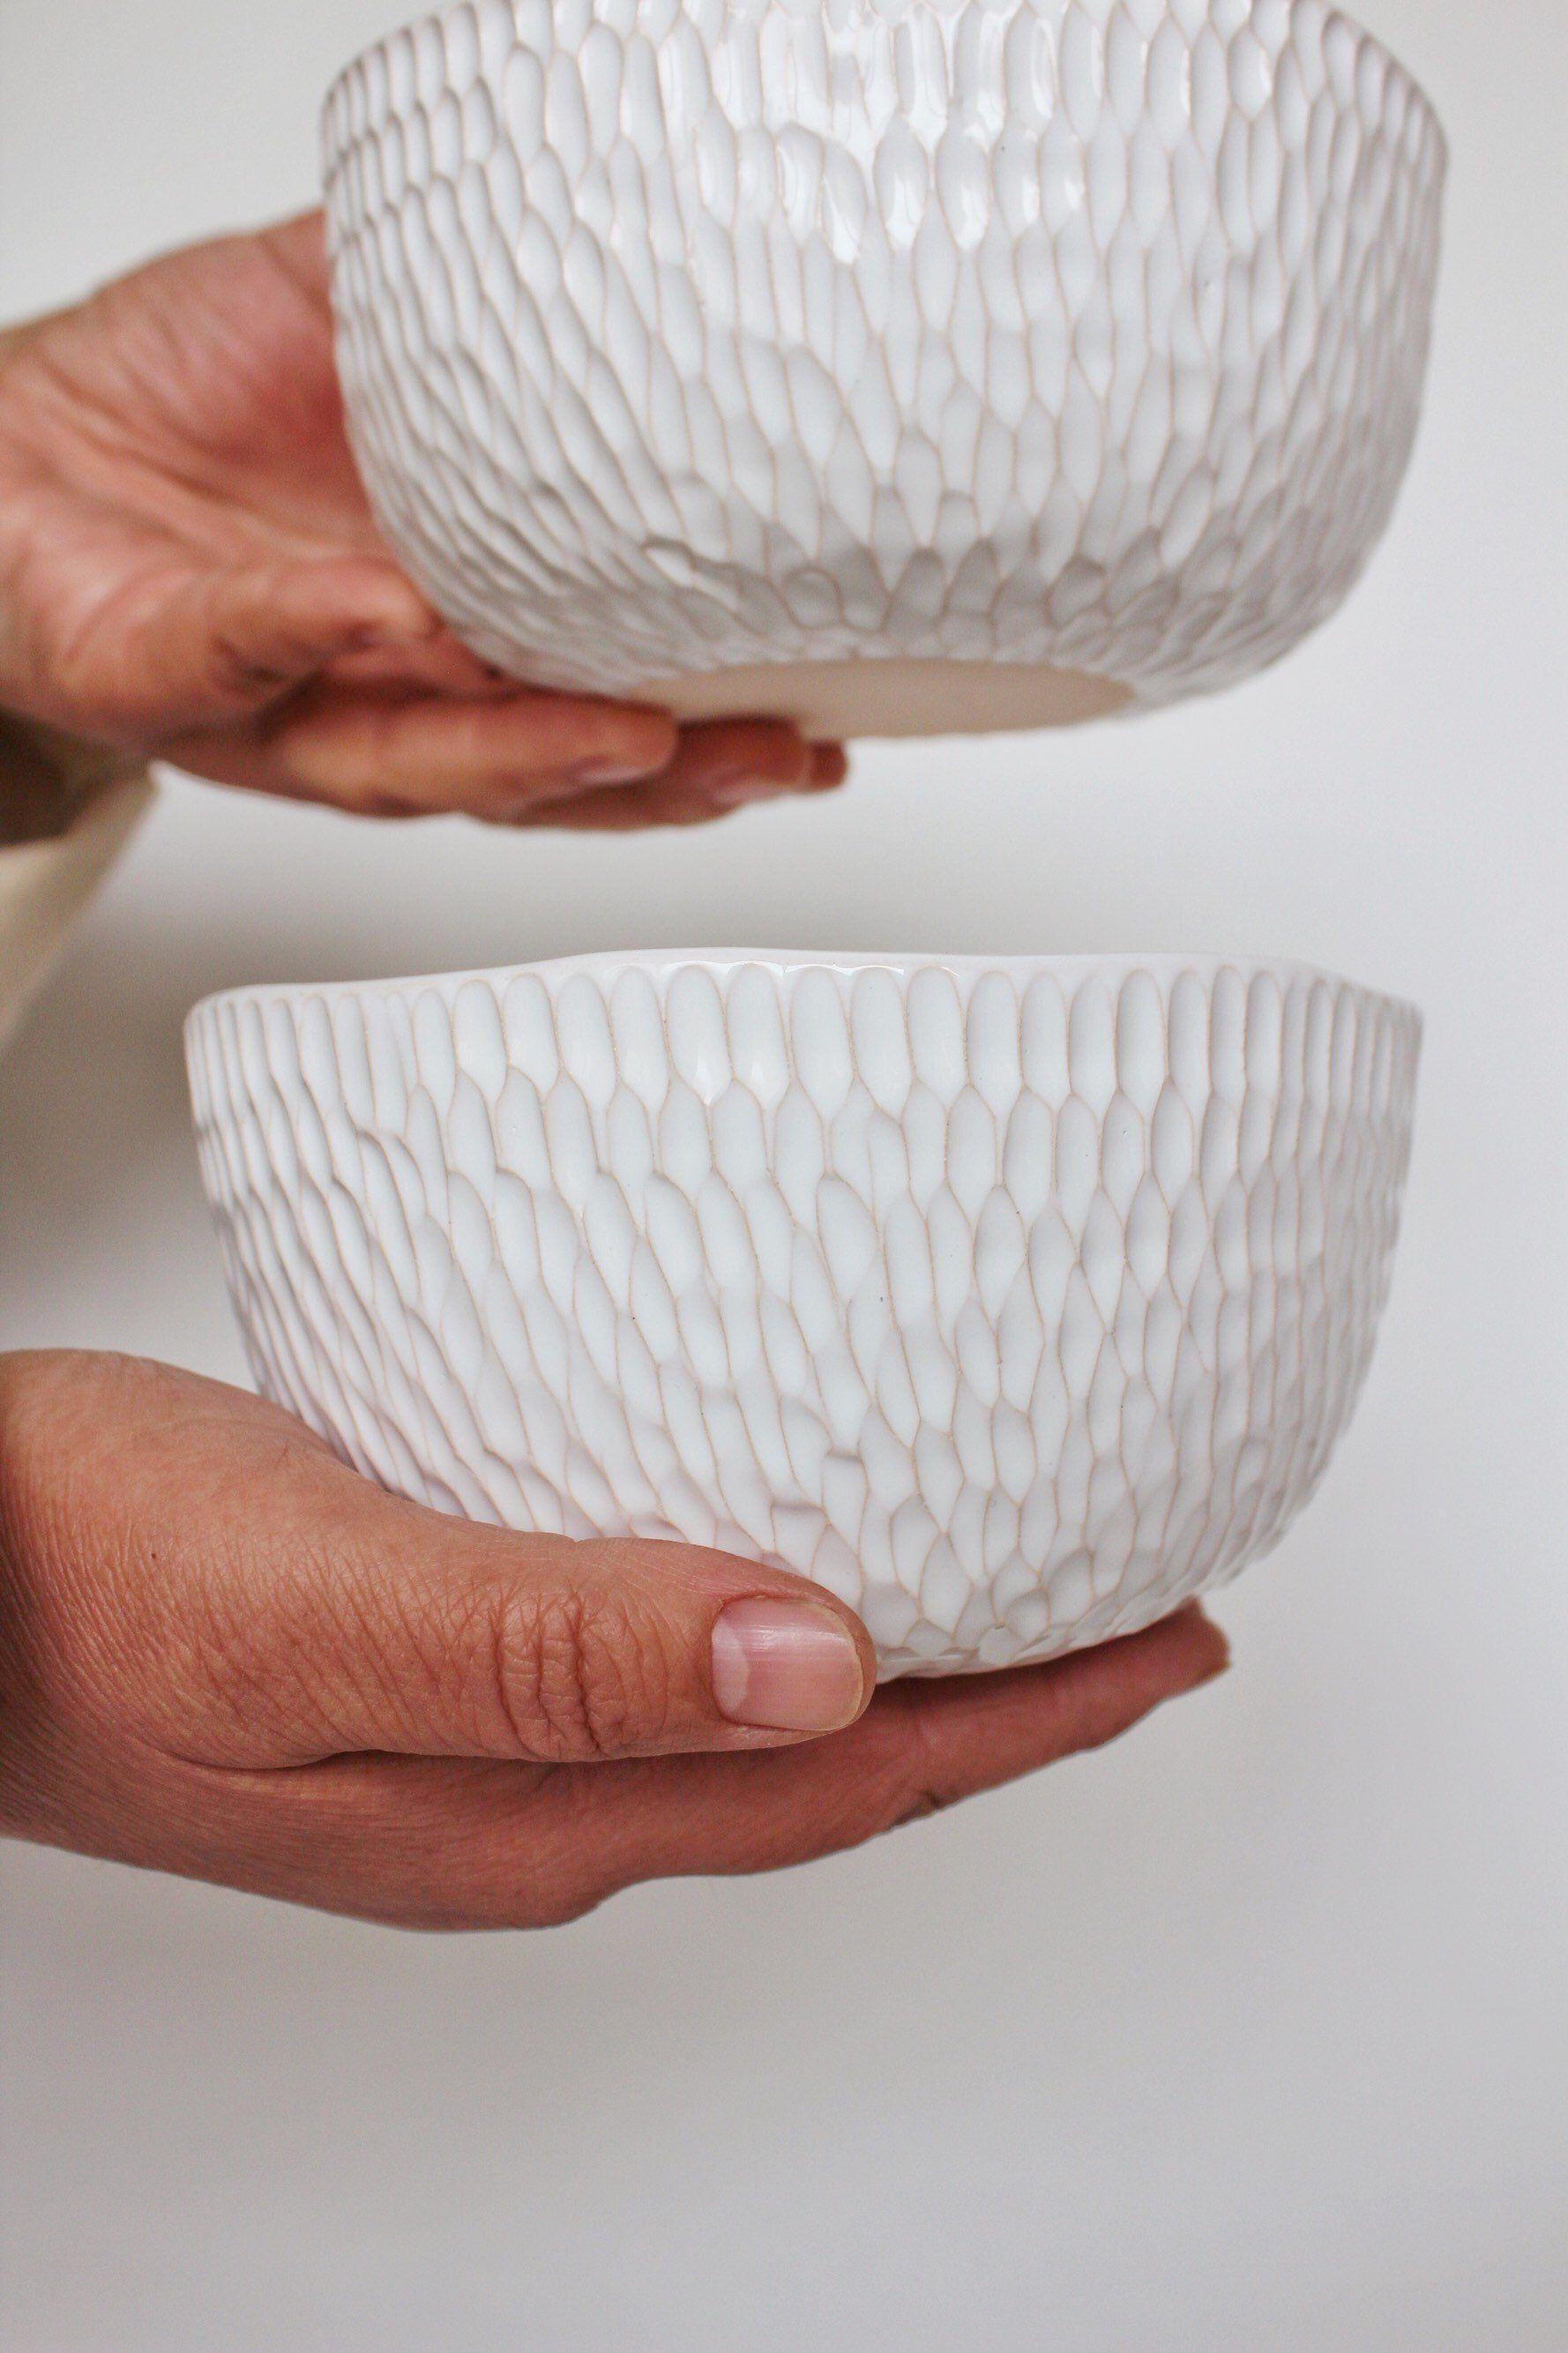 White ceramic dish set, Ceramic salad bowl, Pottery cereal bowl, Ramen bowl, Soup bowl, Stoneware Serving Bowls, Handmade dinnerware set #ceramicpottery